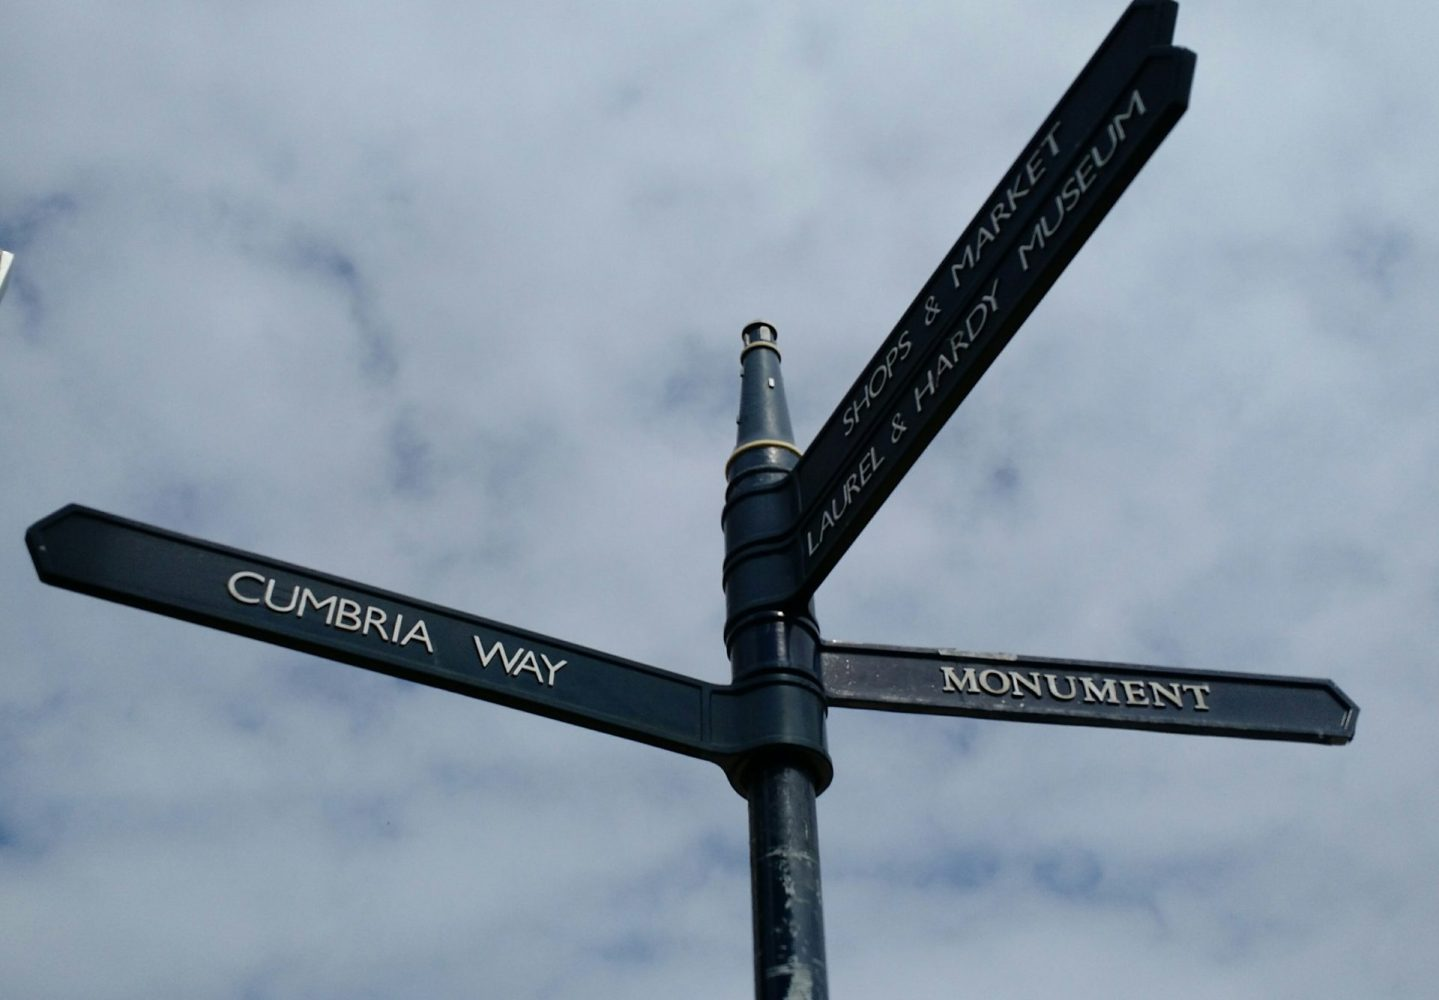 Ulverston Cumbria Way Signpost